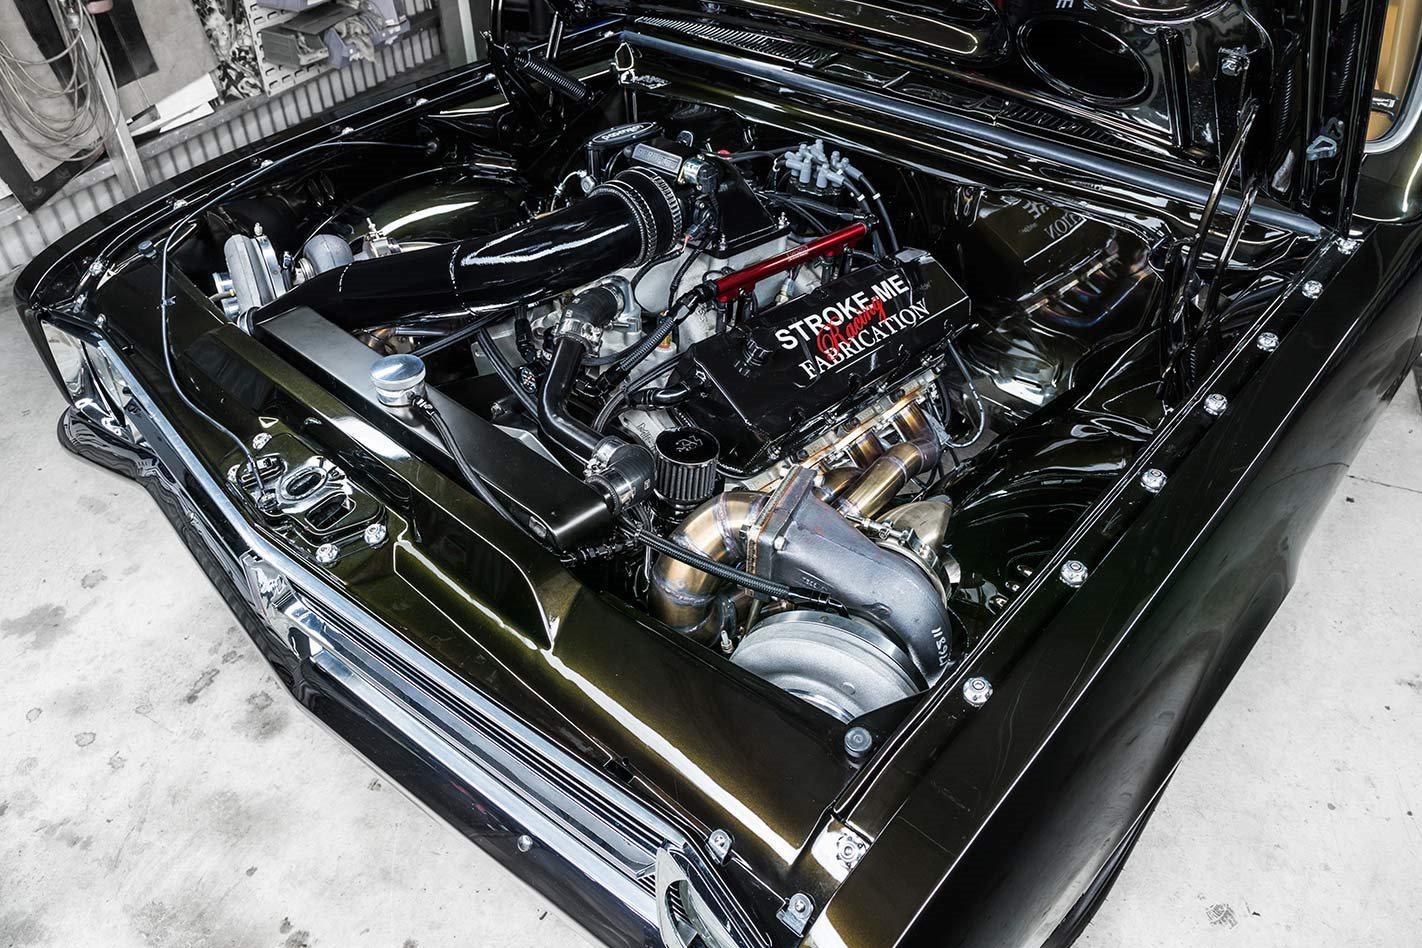 Holden HK Molnaro engine bay